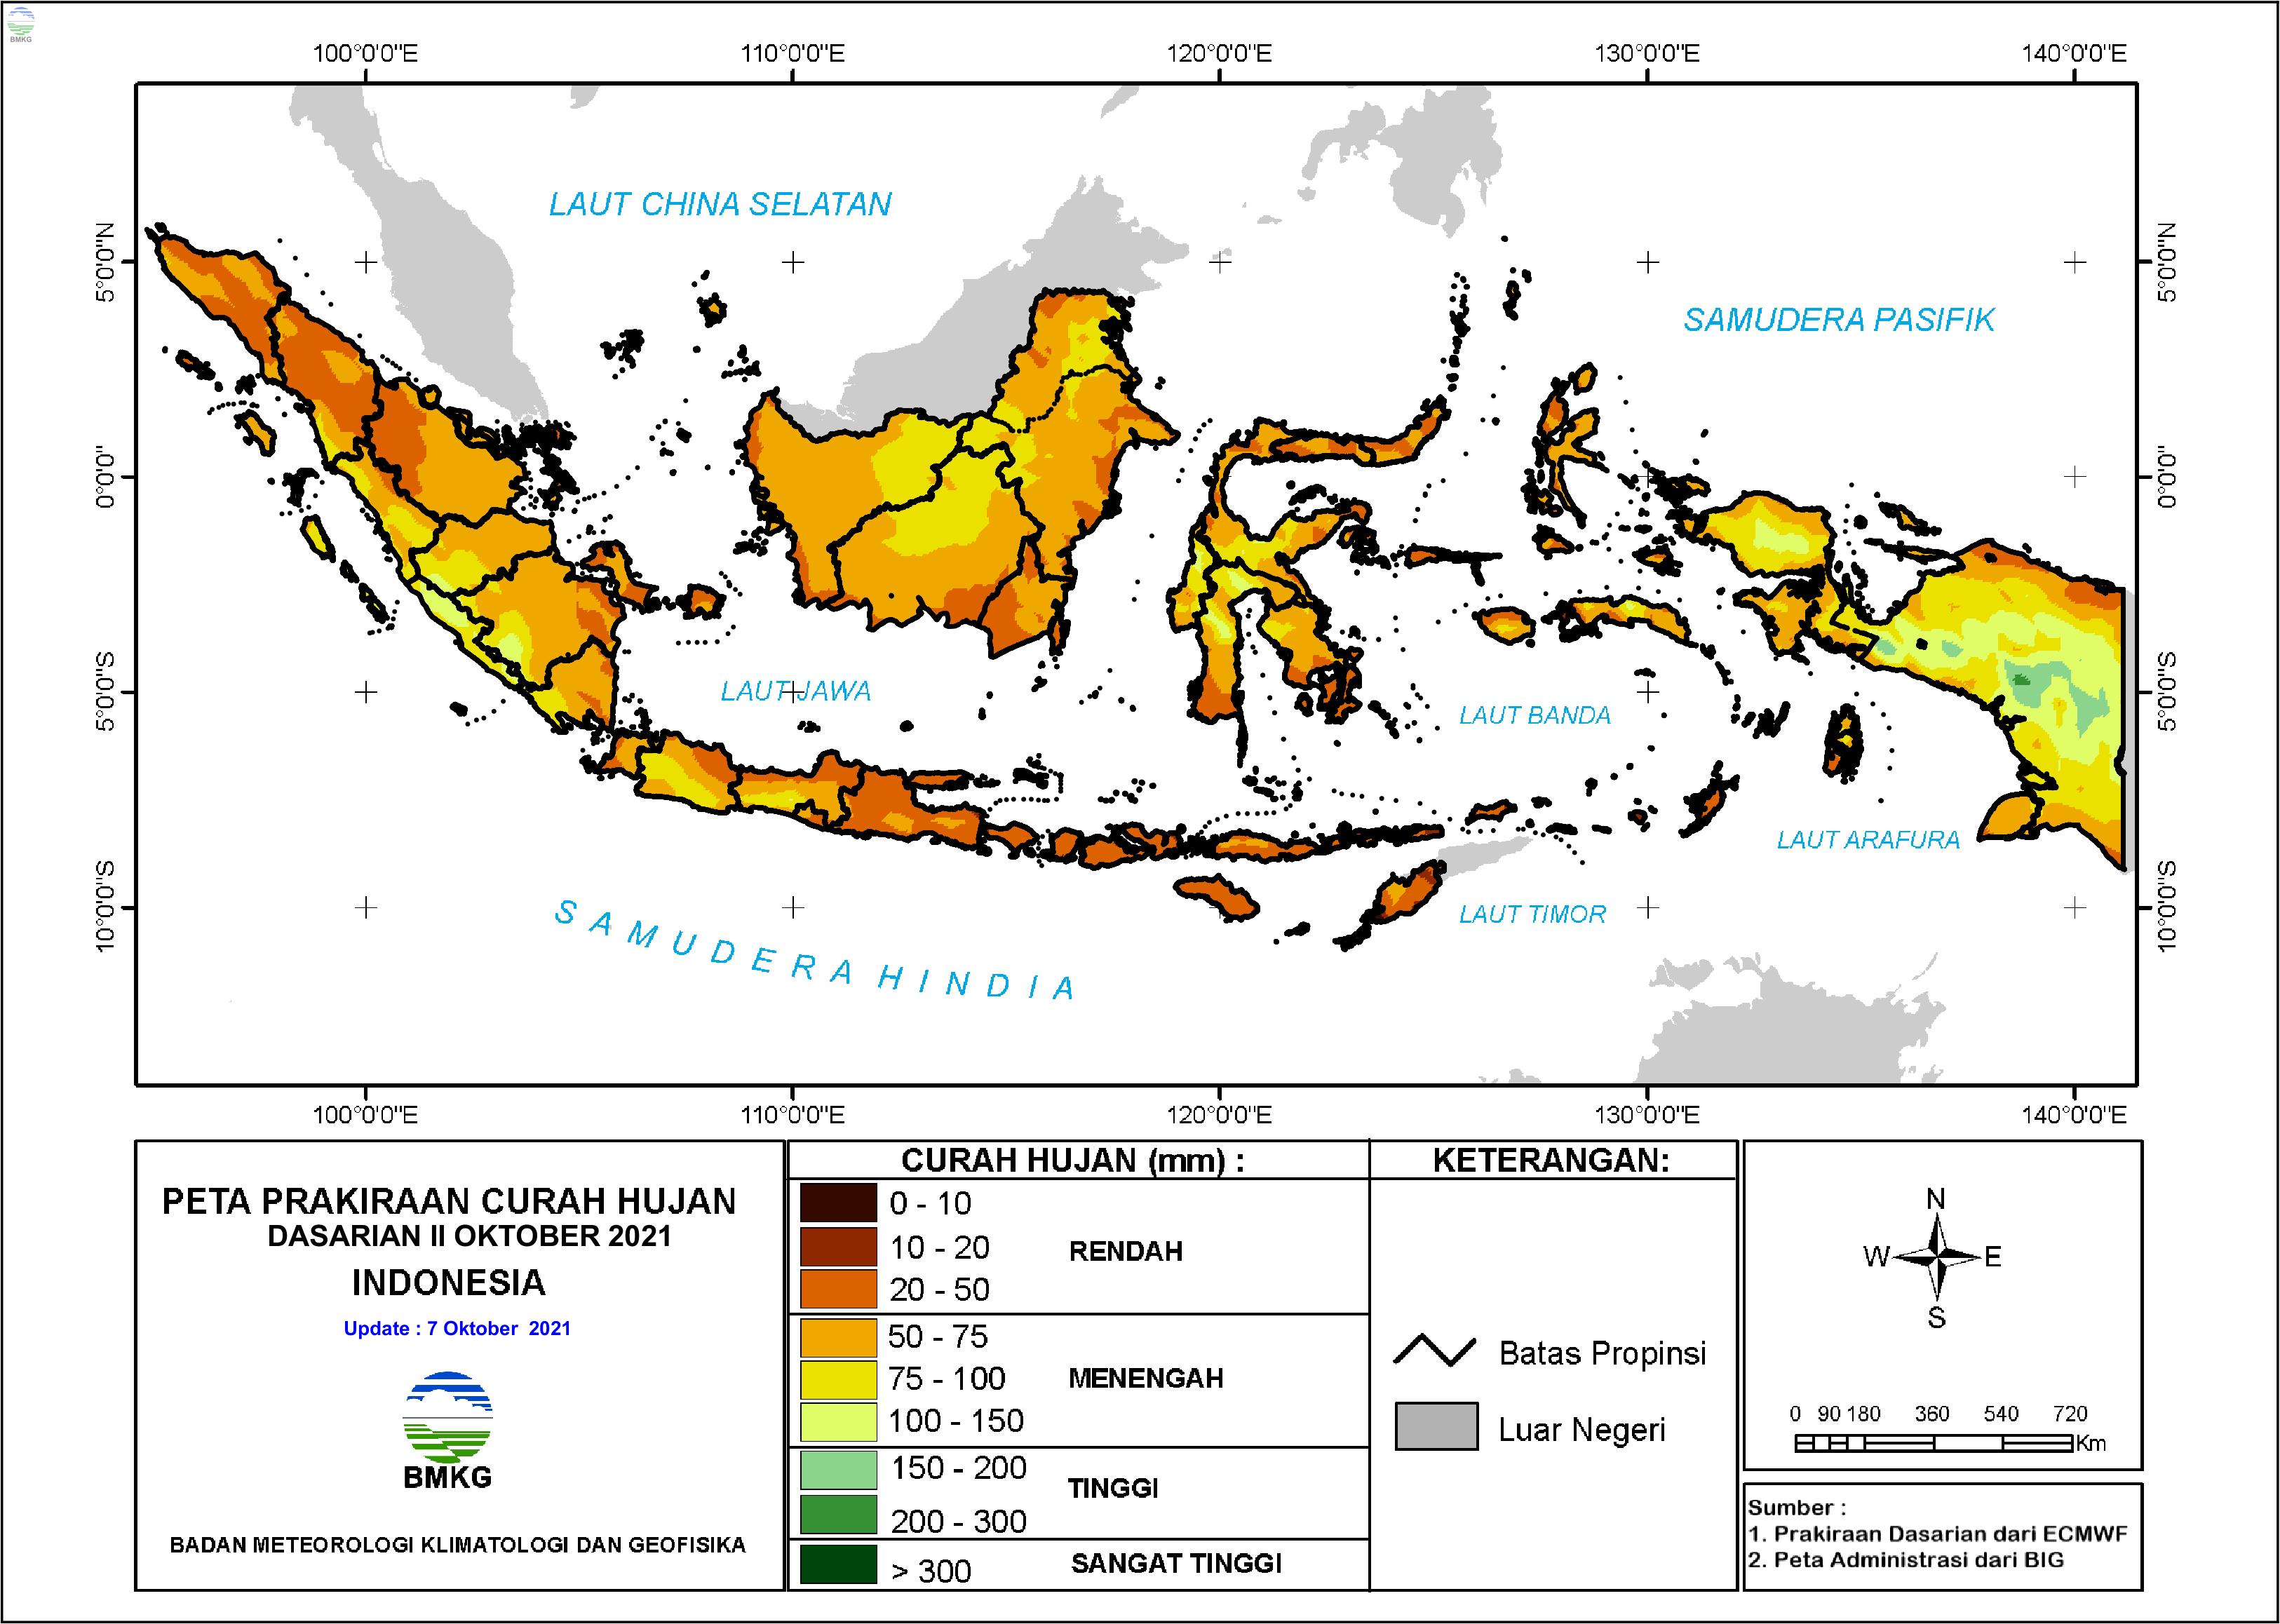 Prakiraan Curah Hujan Dasarian II-III Oktober dan I November 2021